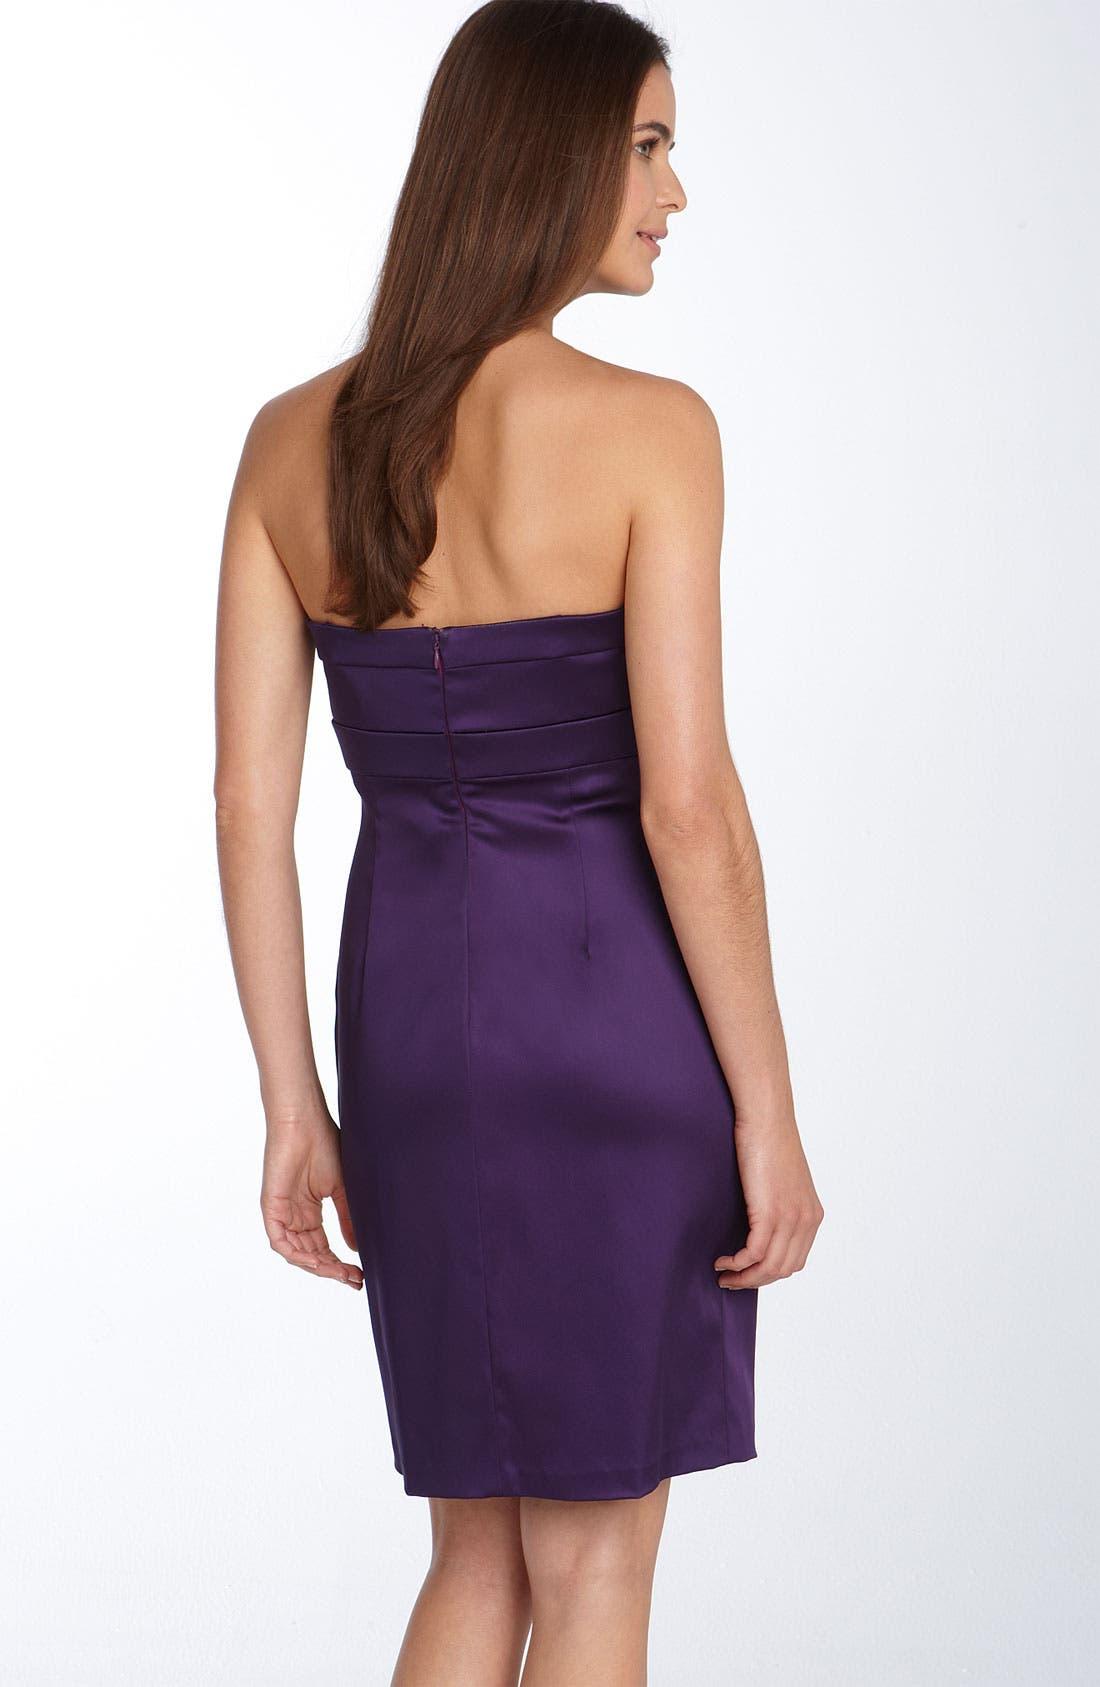 Embellished Stretch Satin Sheath Dress,                             Alternate thumbnail 2, color,                             524